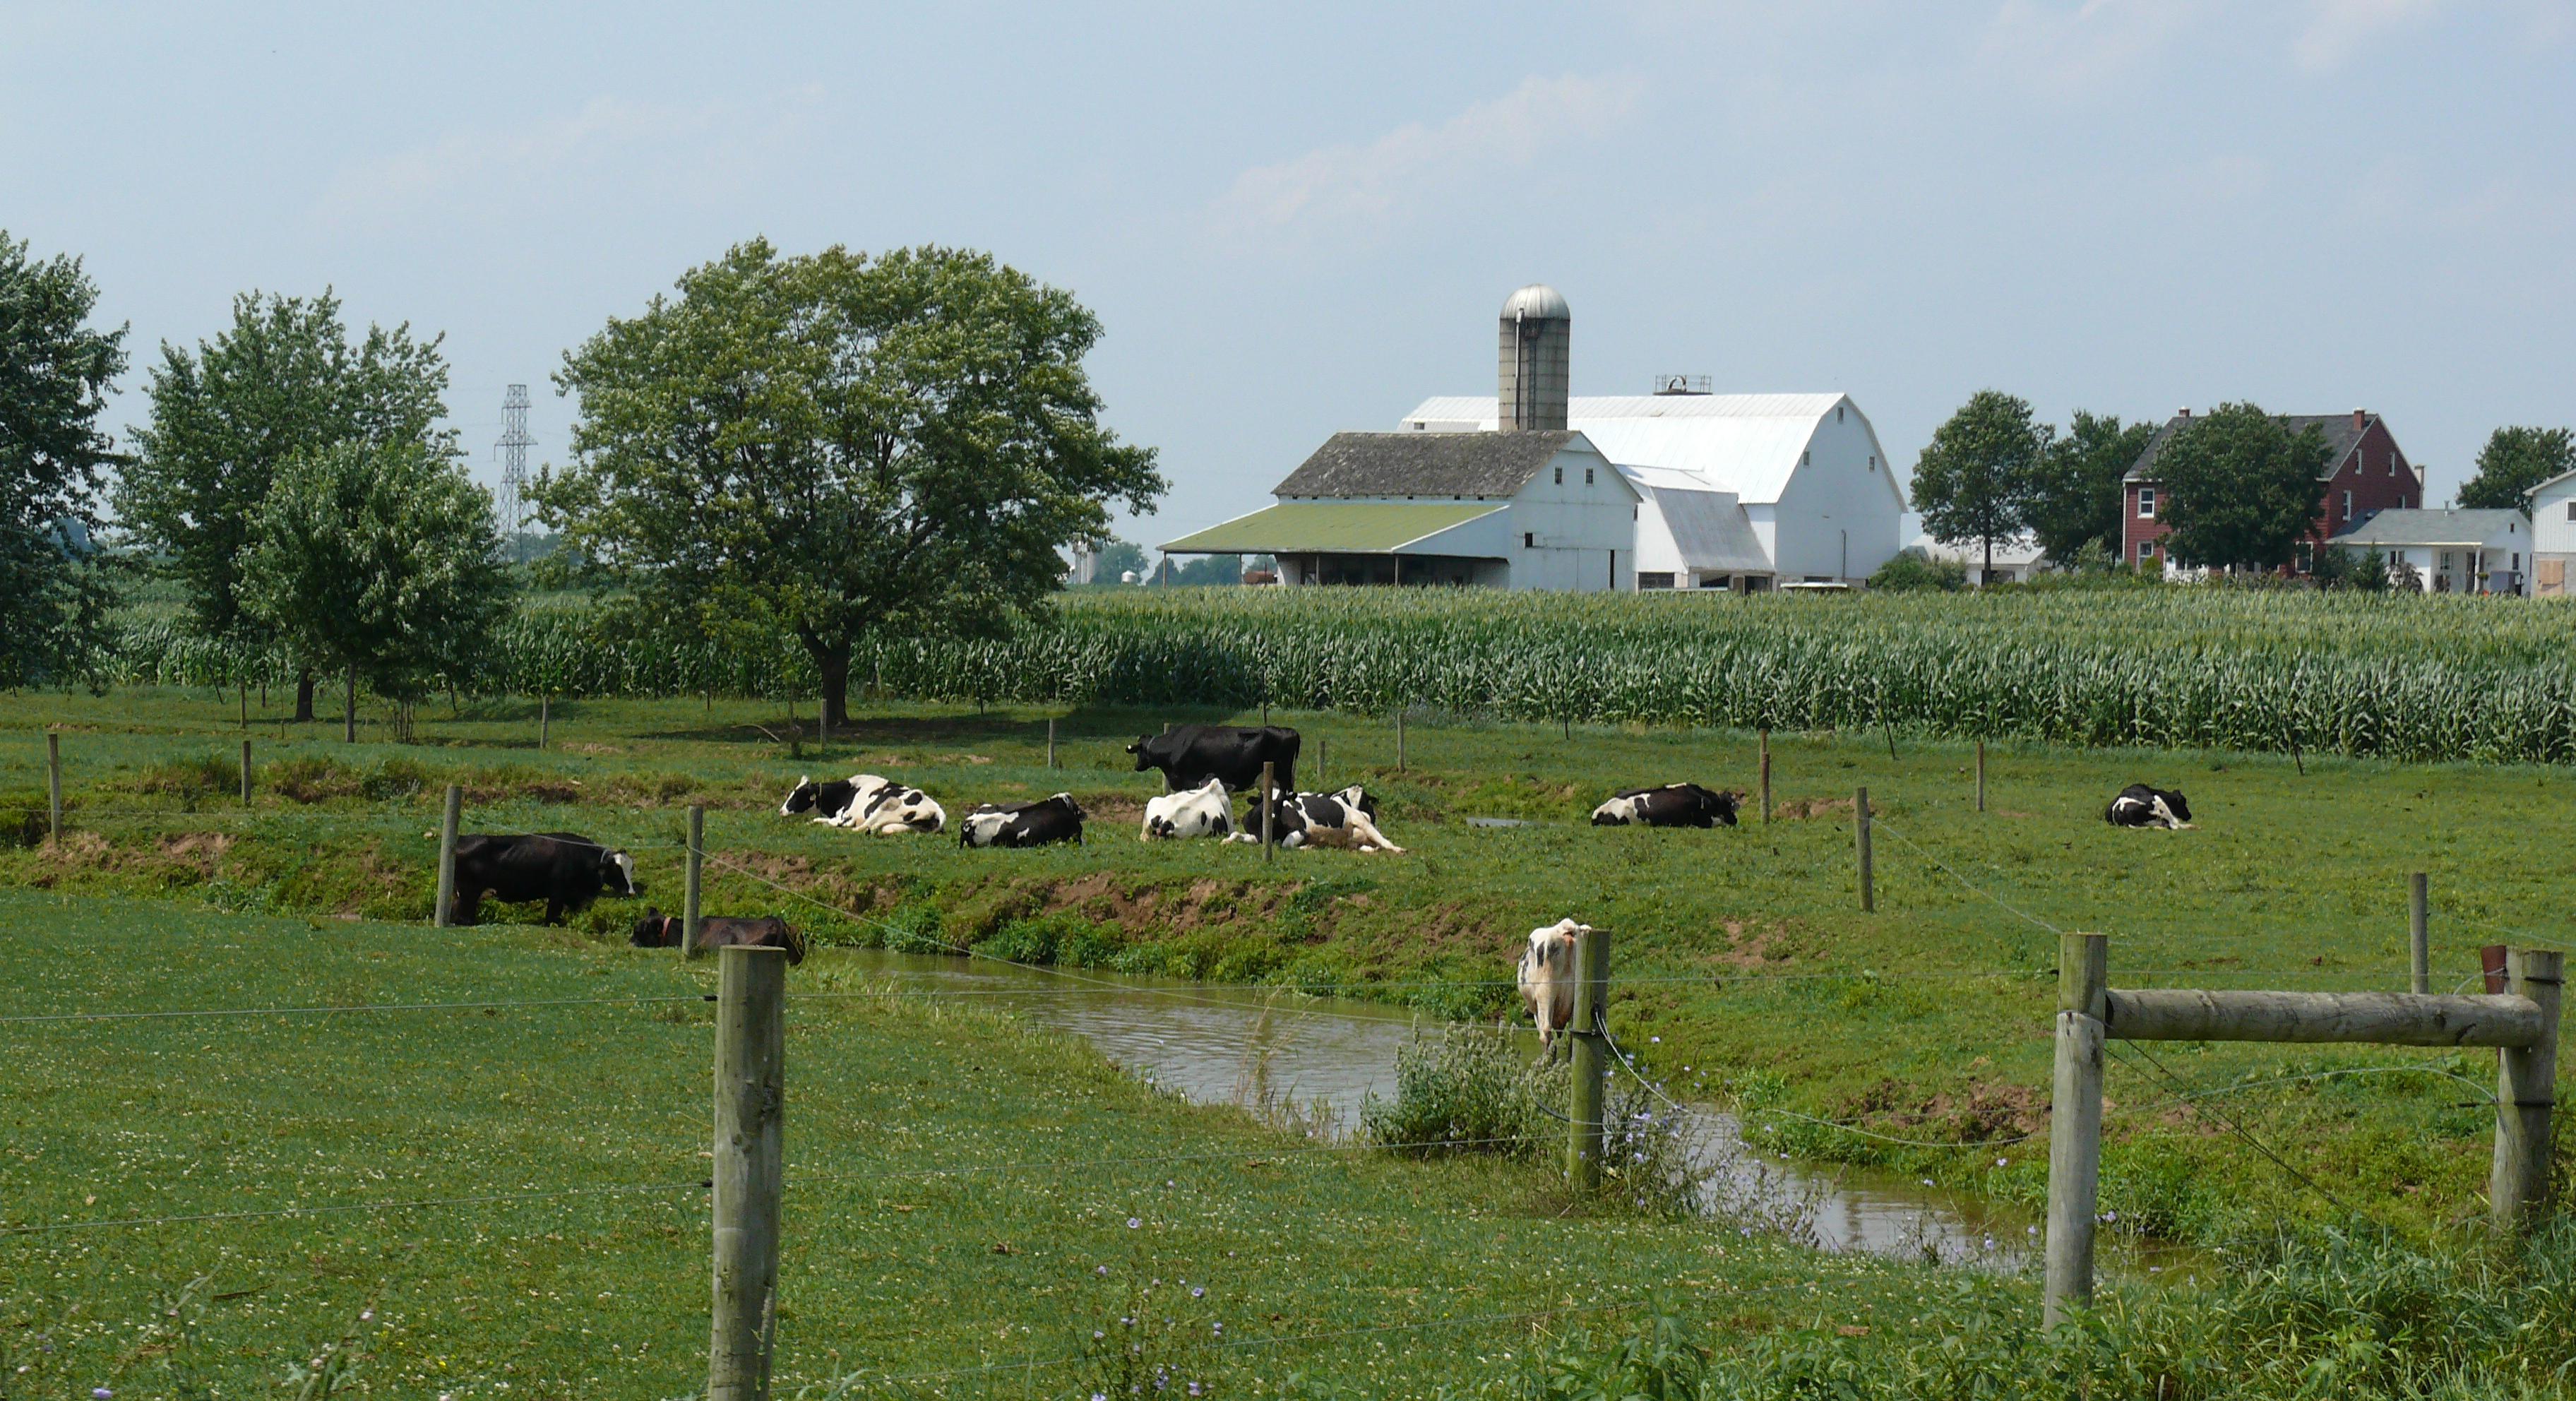 File:Amish dairy farm 5.jpg - Wikimedia Commons